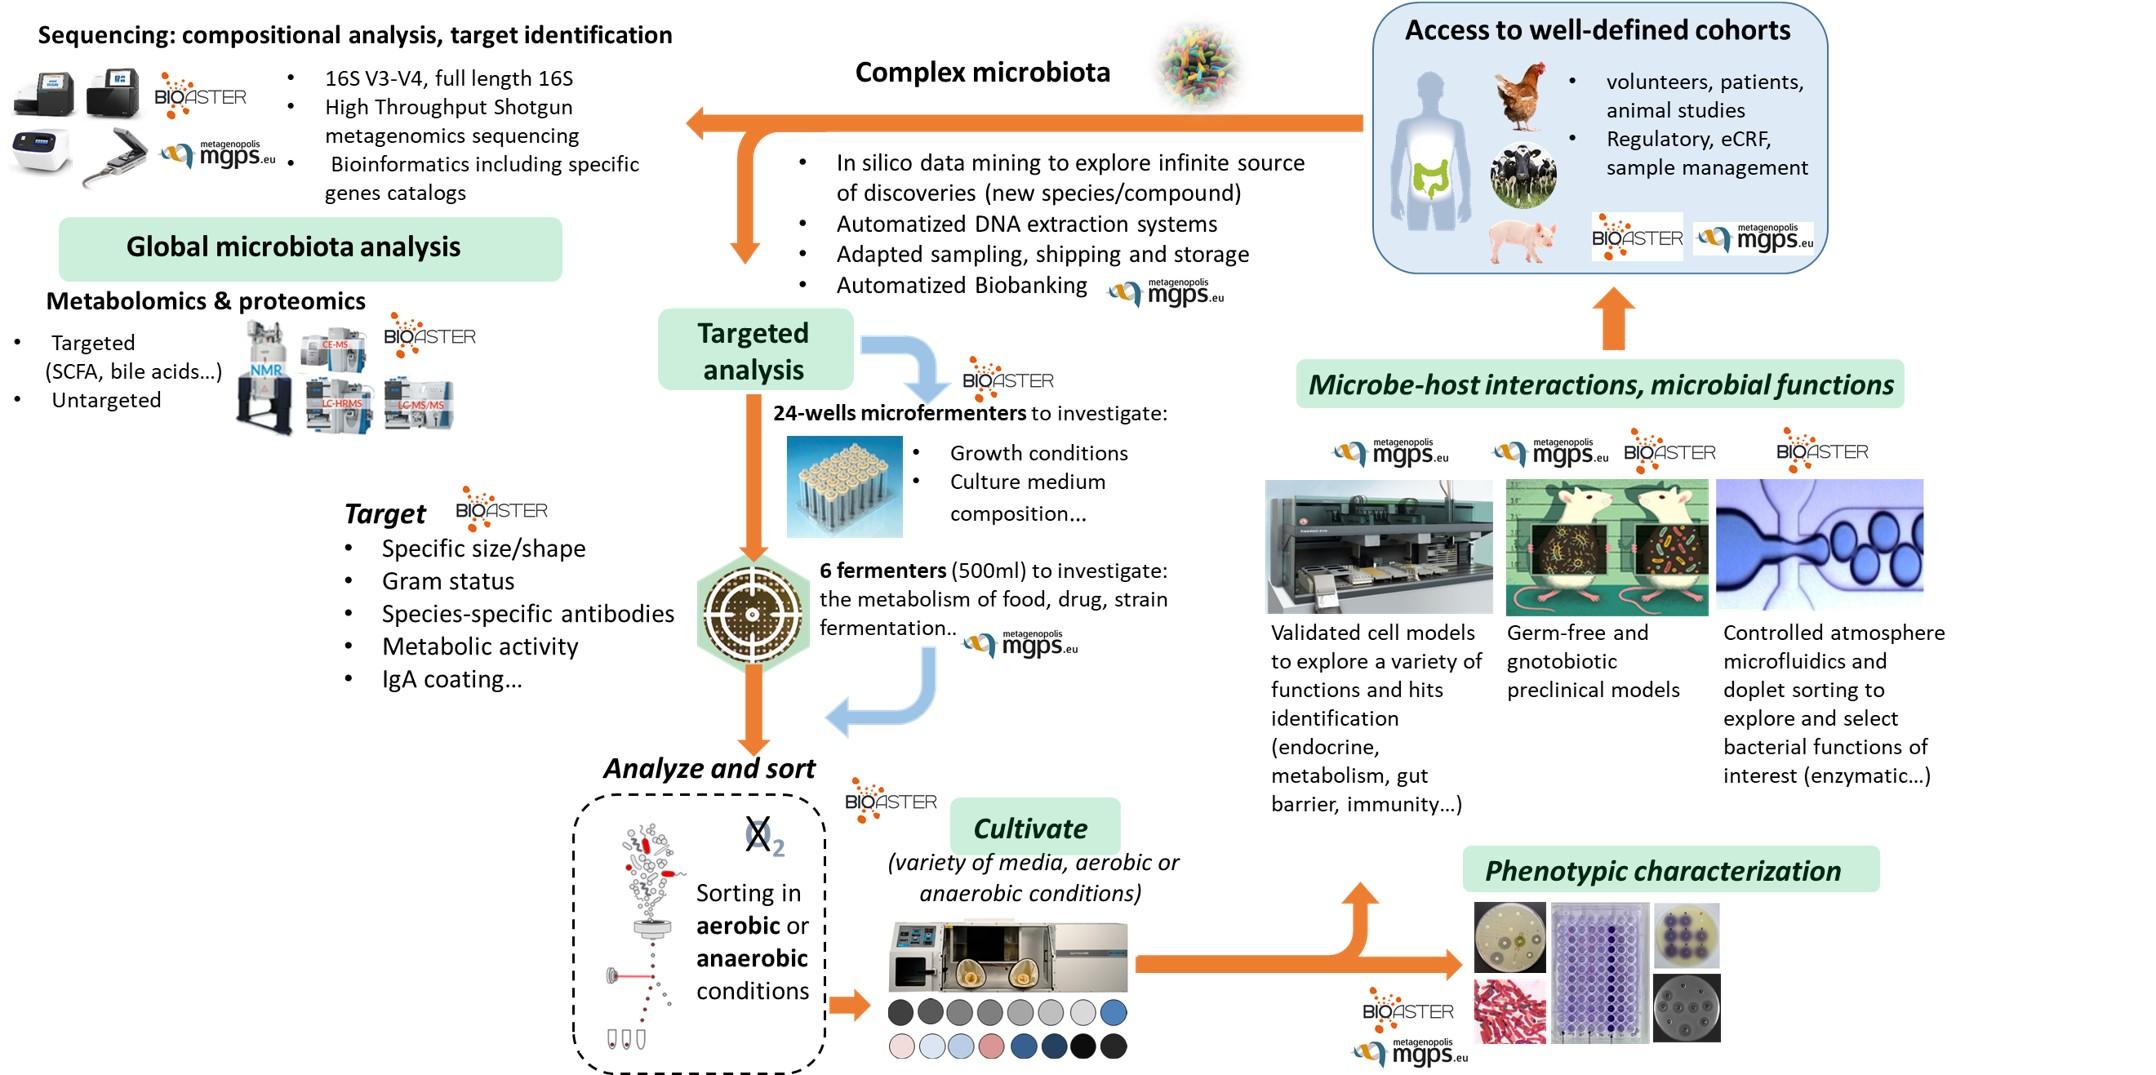 MICROBIOTA; ISOLATOR .PROTEOMICS. MICROFLUIDICS ;METABOLOMICS